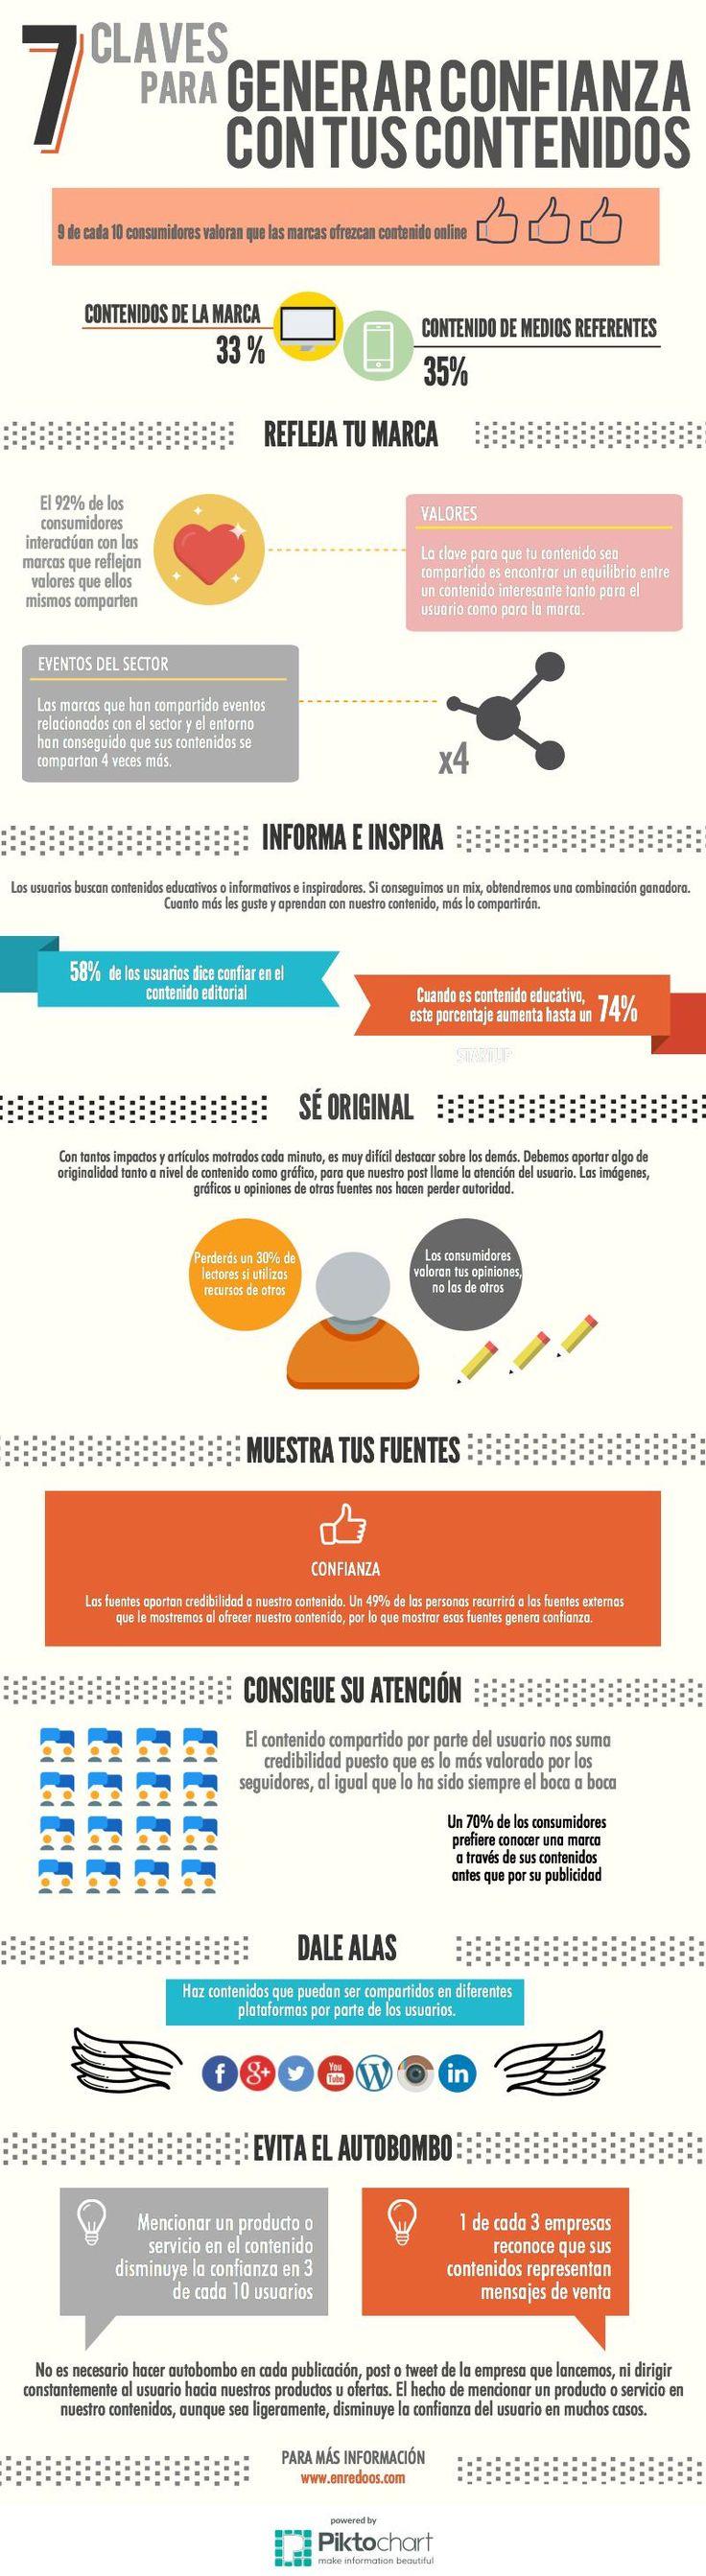 7 claves para generar confianza con tus Contenidos #infografia #infographic #marketing